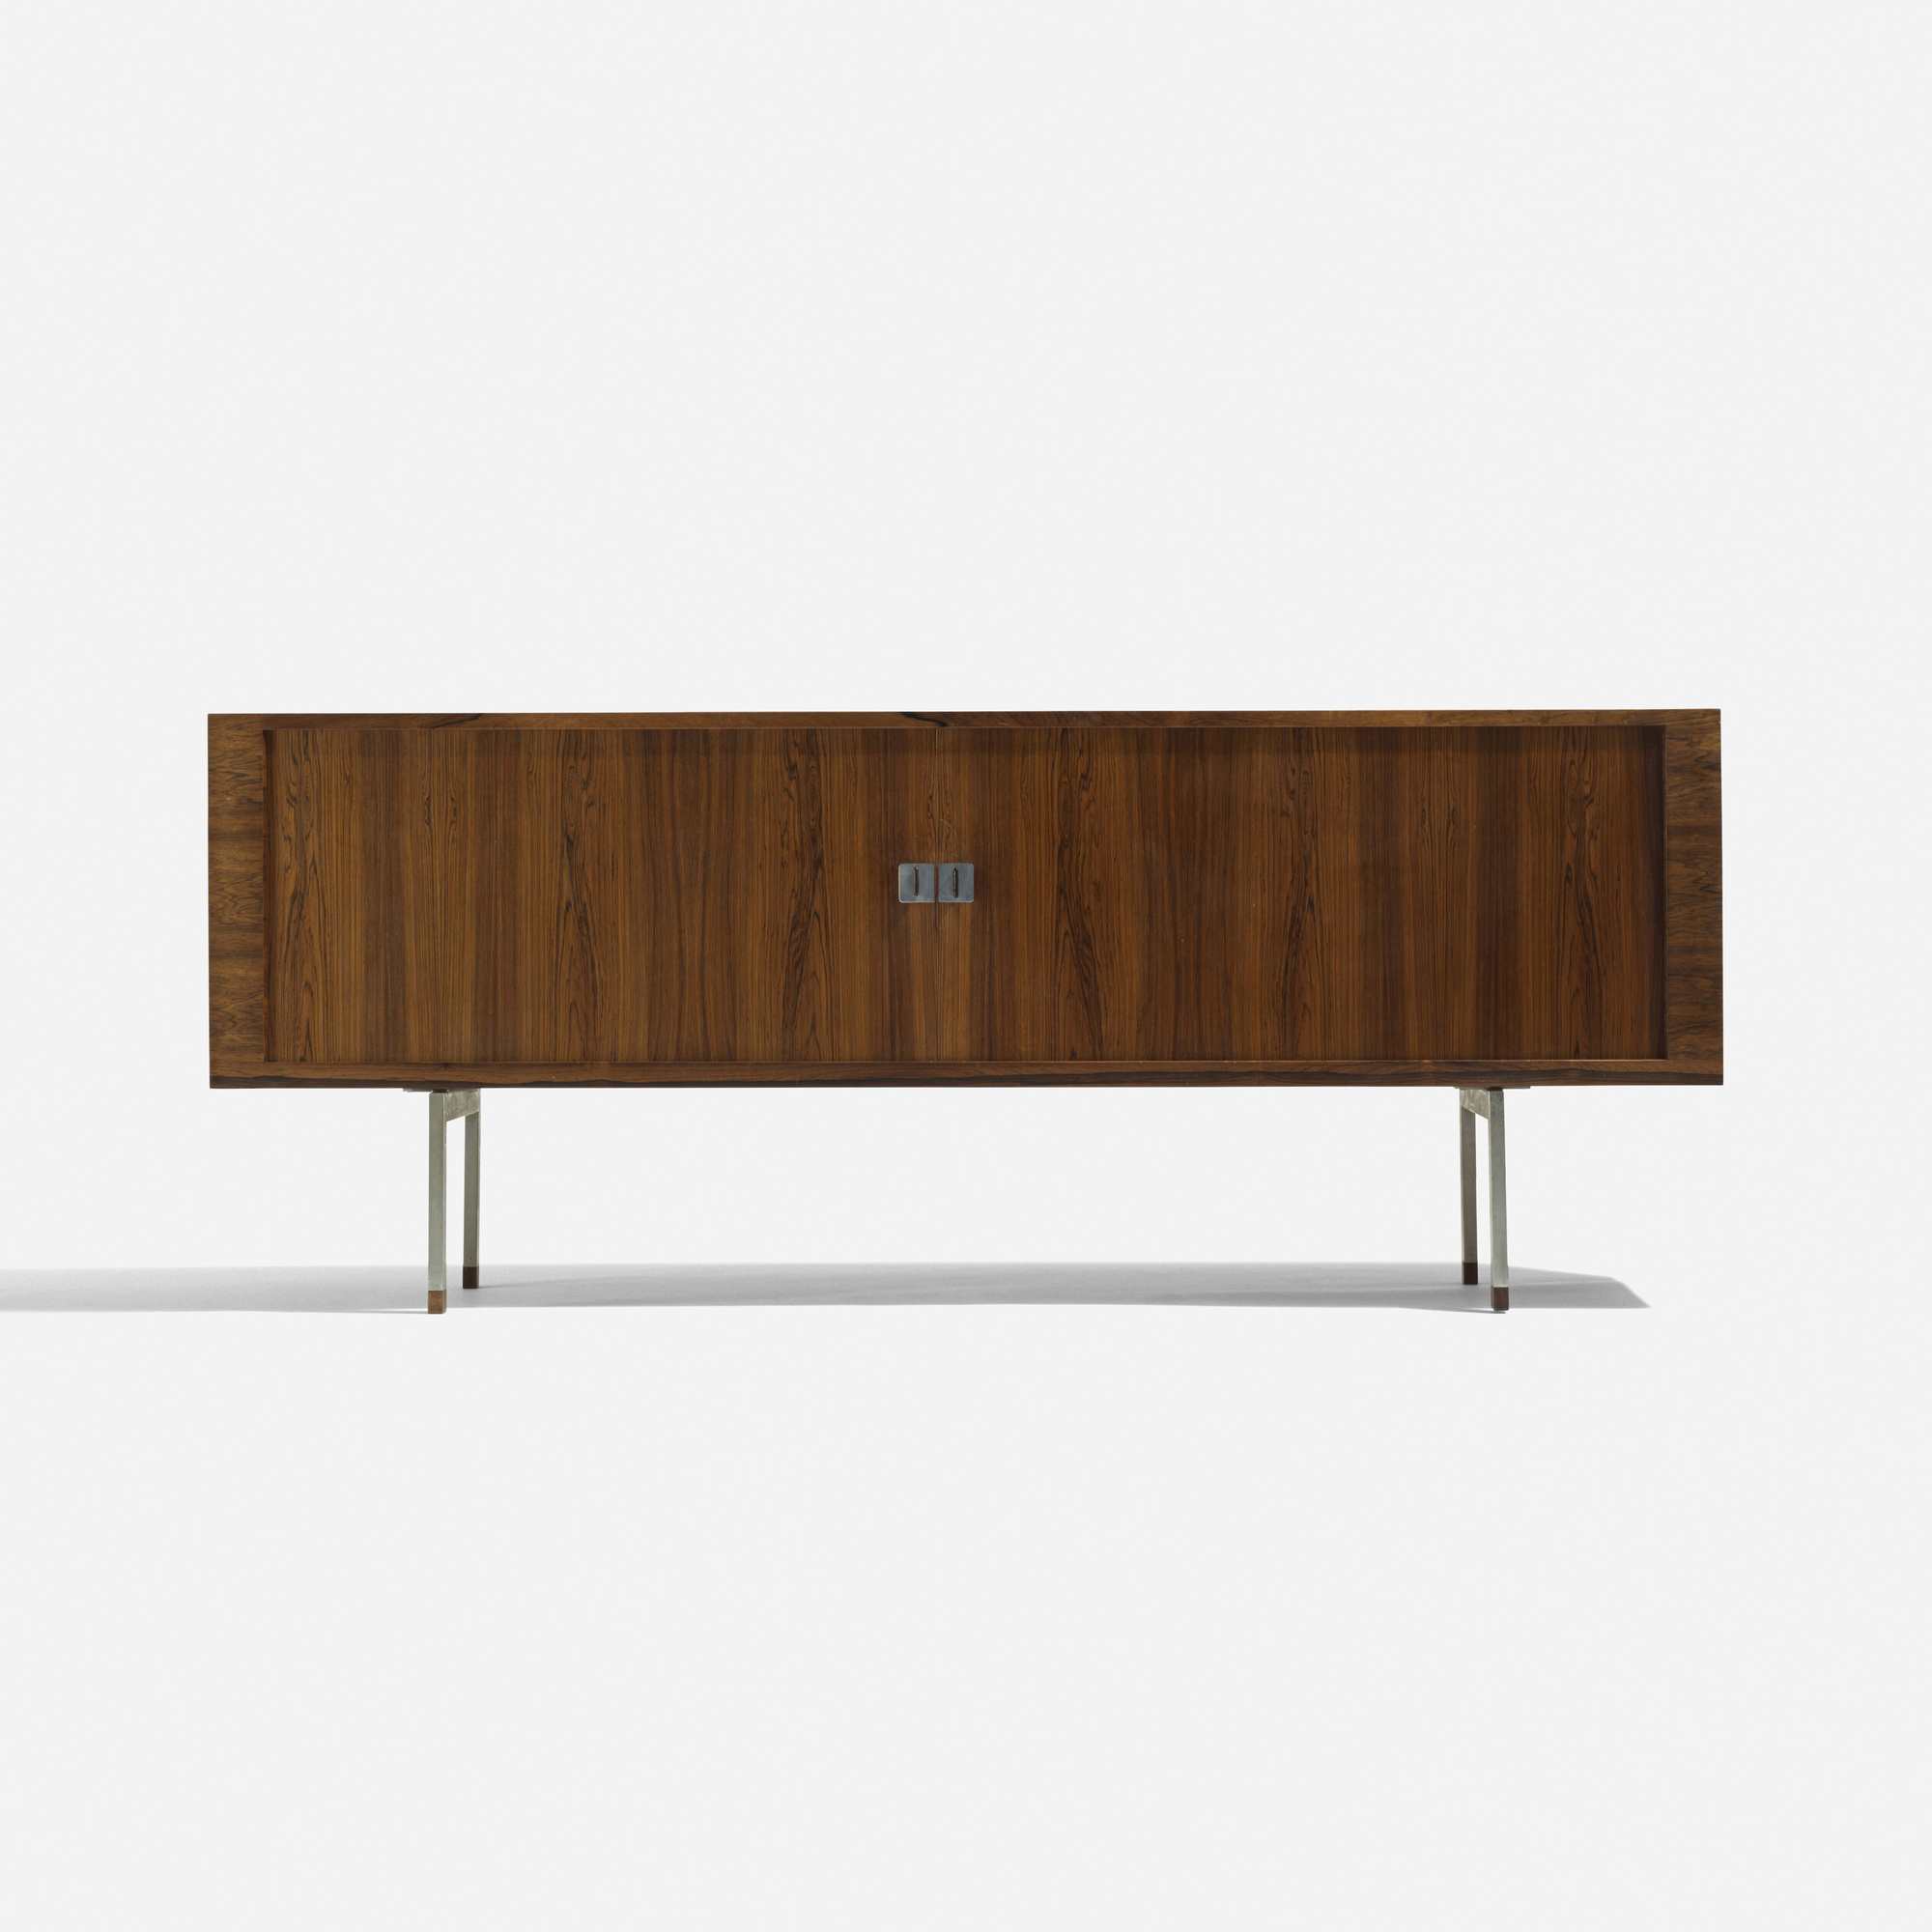 277: Hans J. Wegner / cabinet, model RY25 (2 of 4)